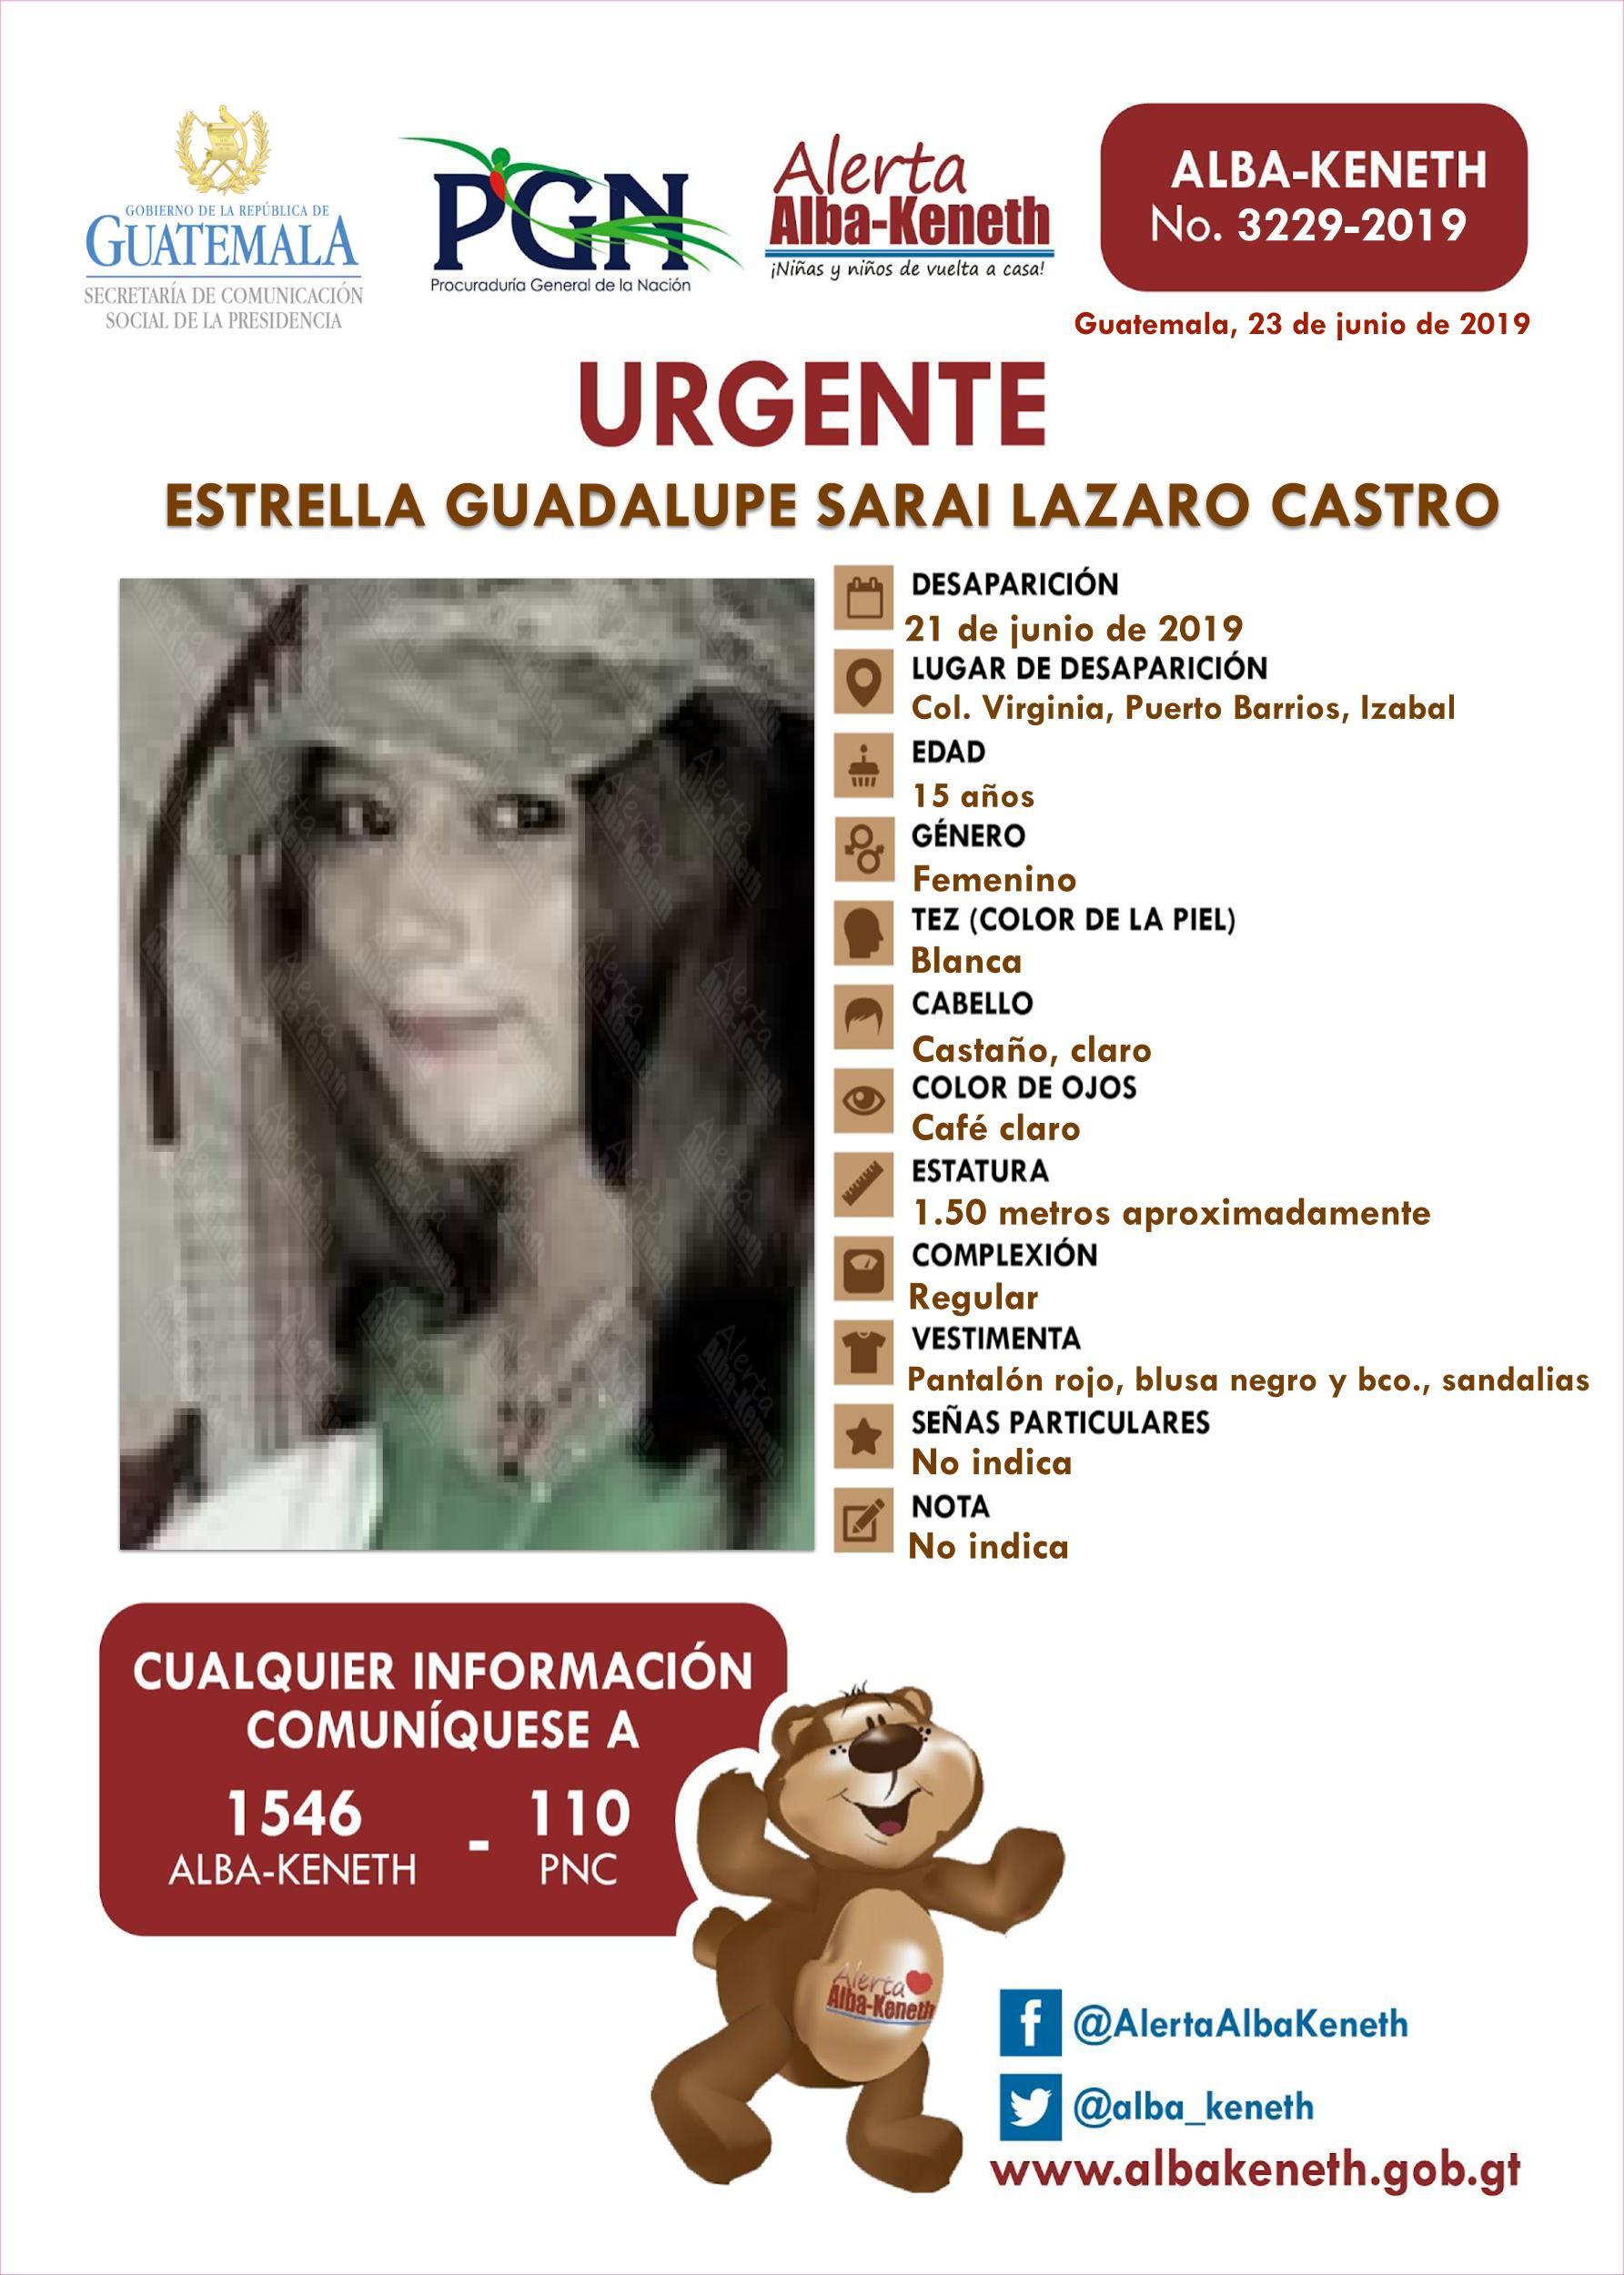 Estrella Guadalupe Sarai Lazaro Castro